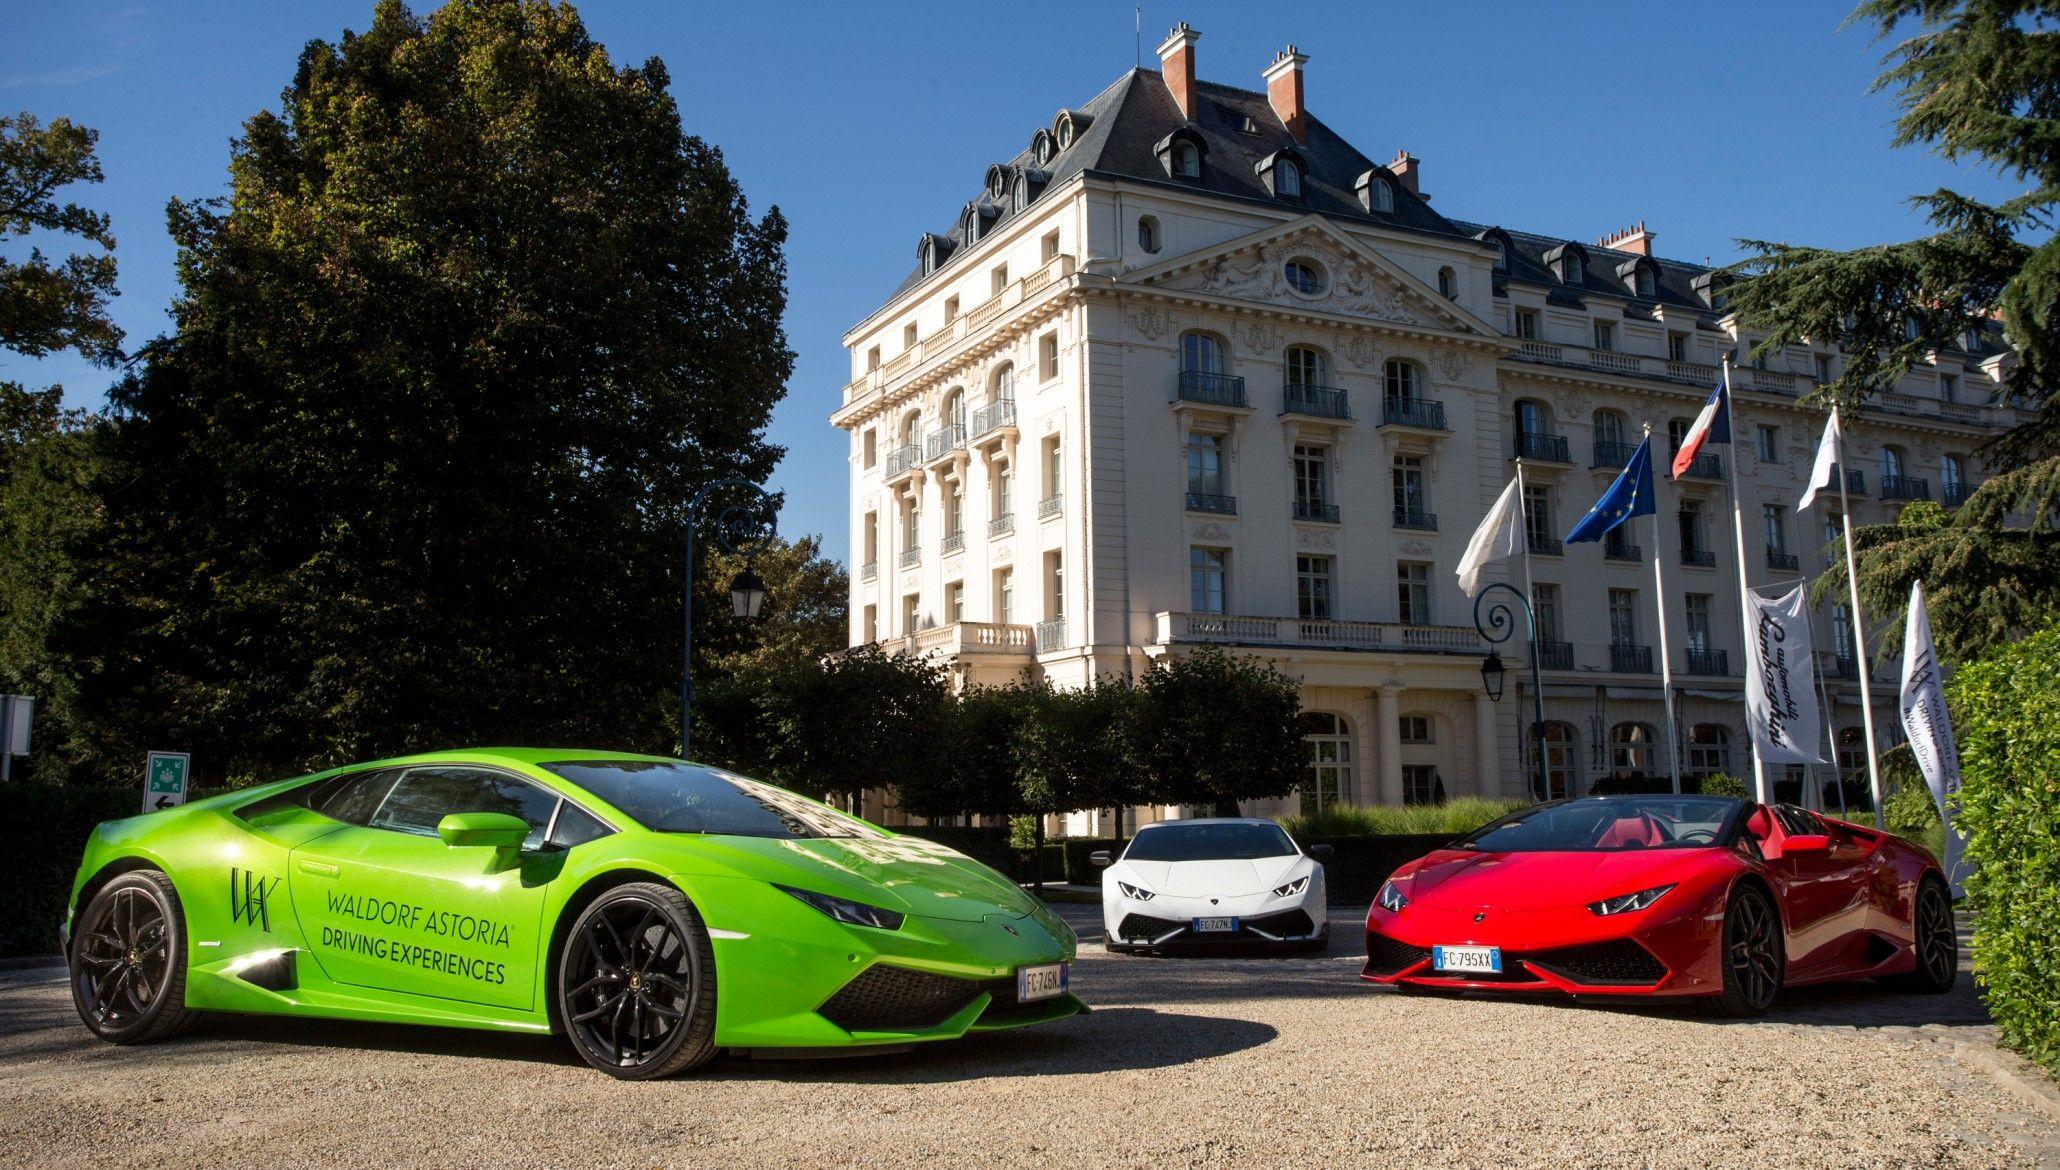 Waldorf Astorias Driving Experiences Deliver The Latest Lamborghinis For 2017 Lamborghini Driving Experience Rear Wheel Drive